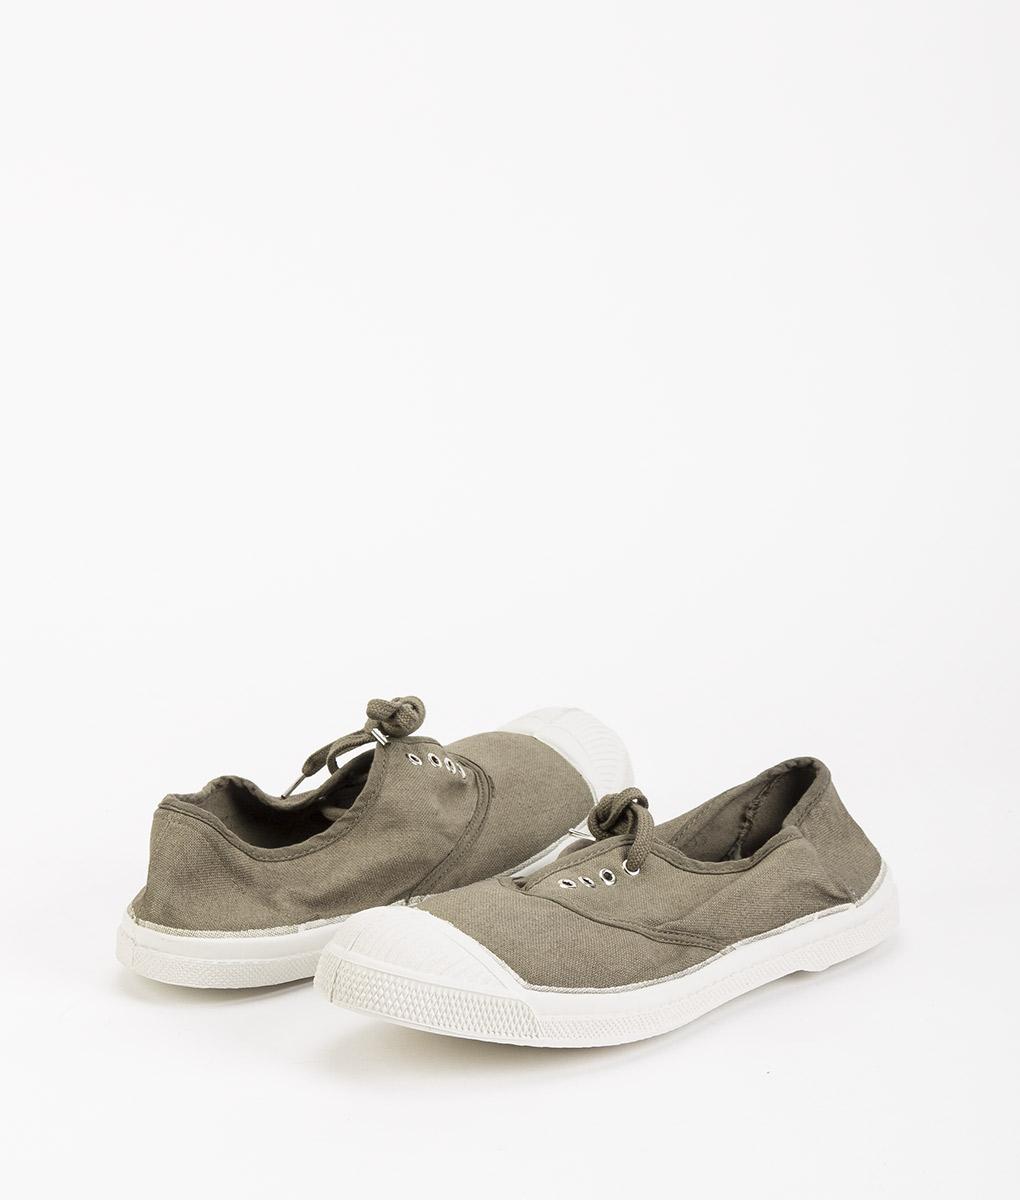 BENSIMON Women Sneakers 15004 TENNIS LACE, Light Khaki 34.99 1